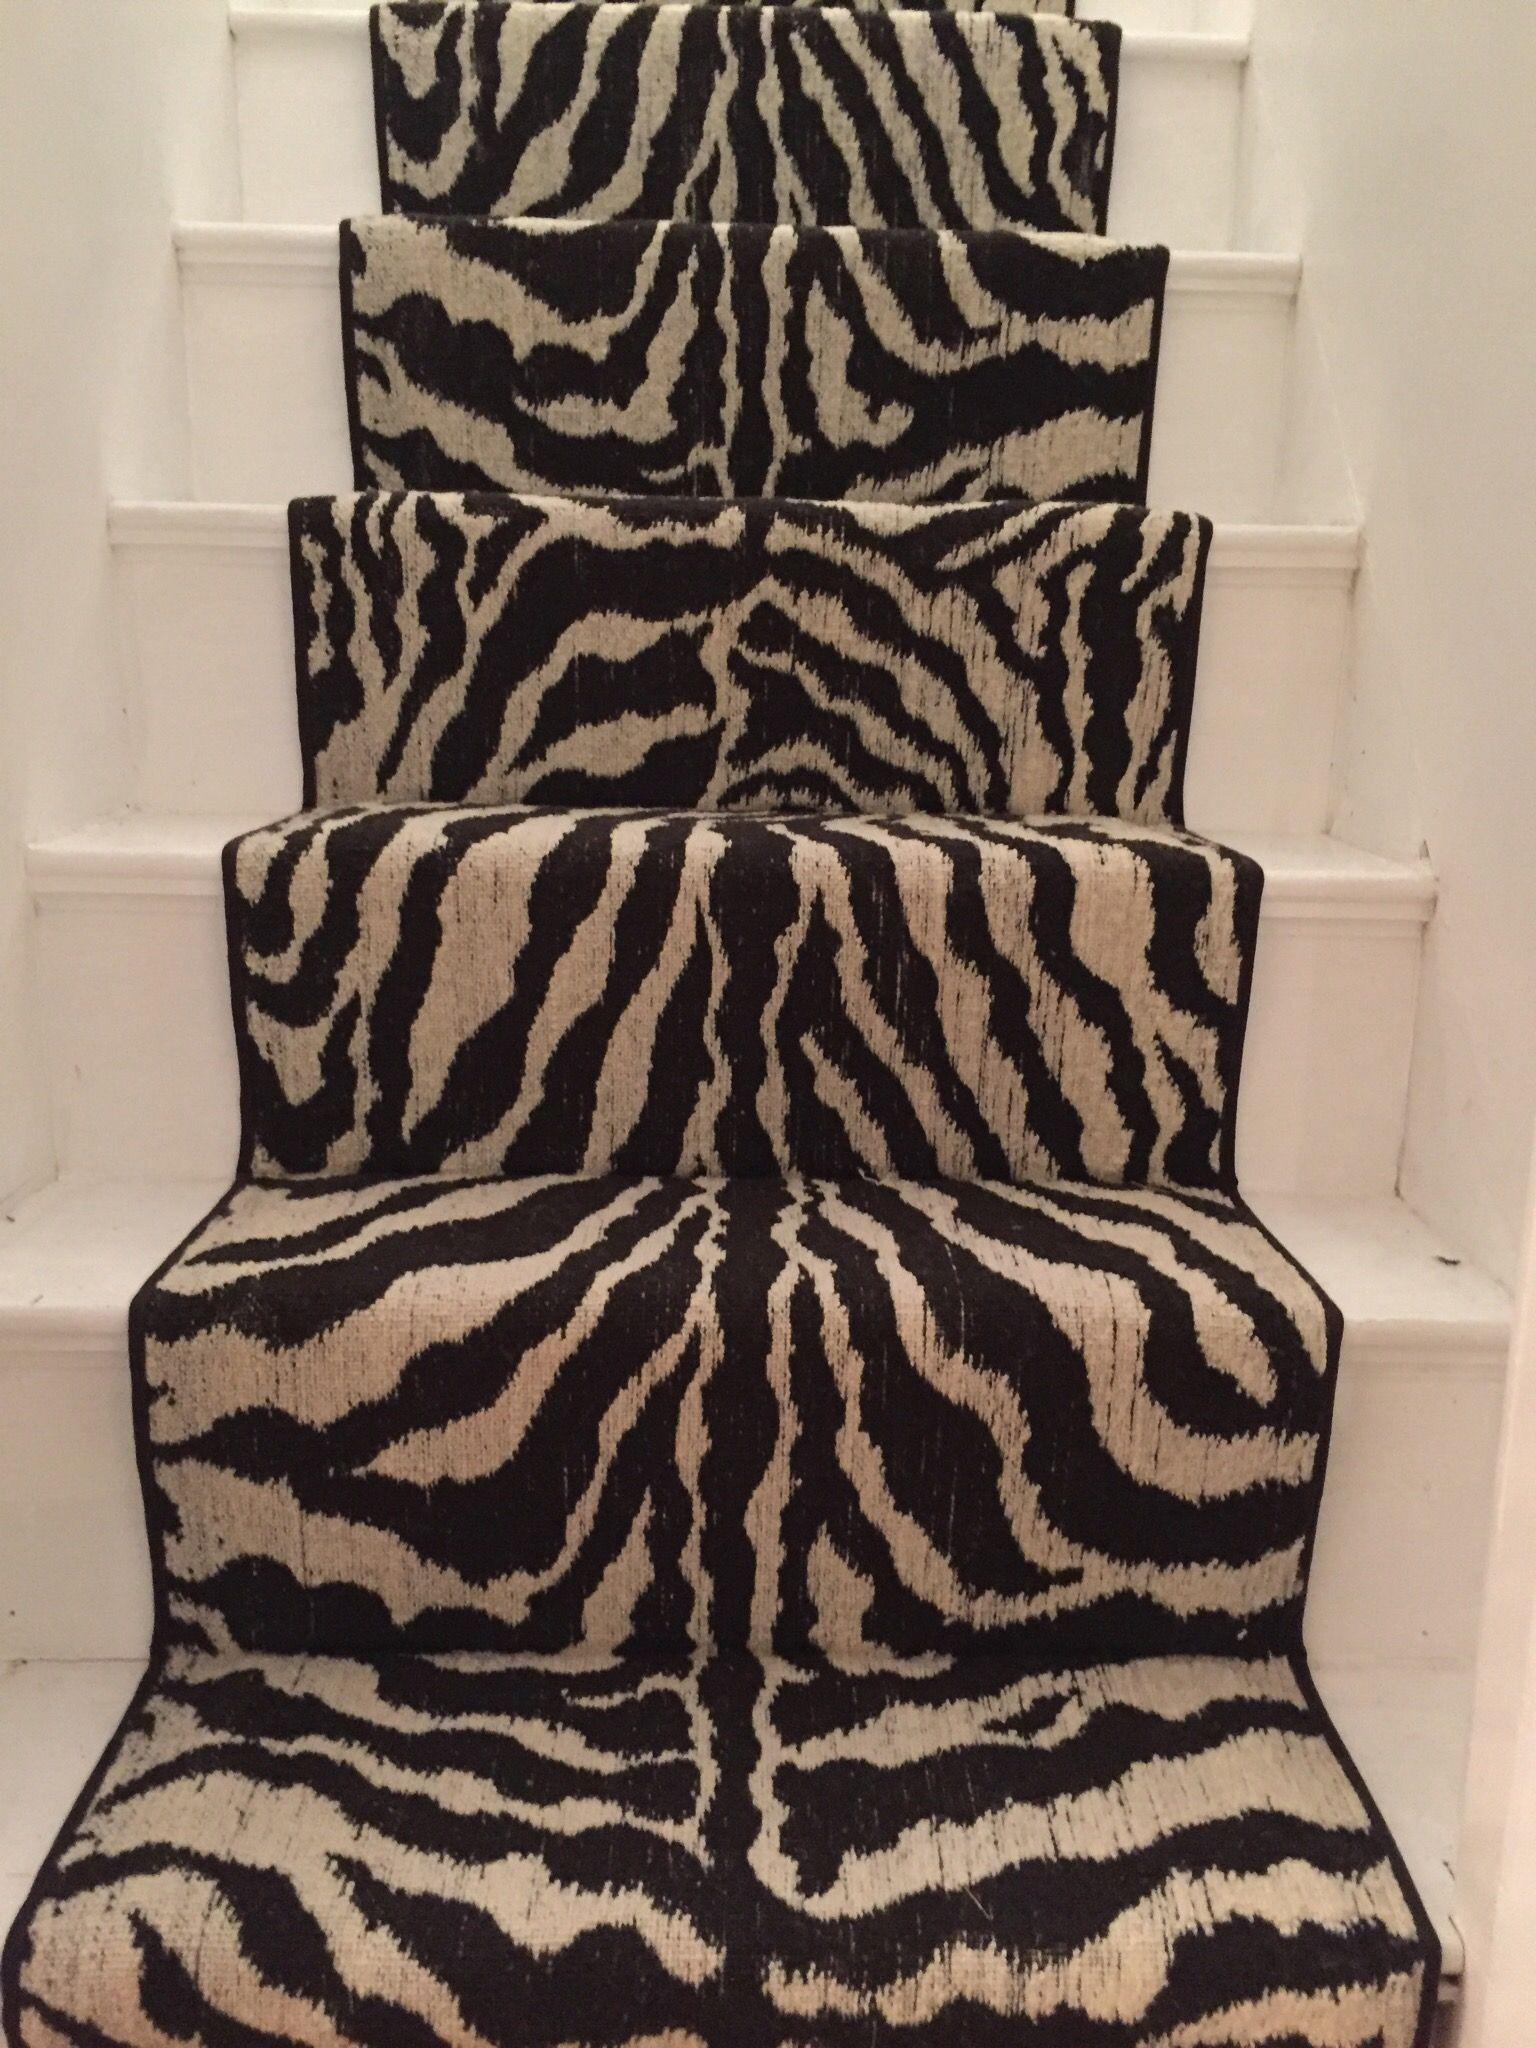 #Zebra Print #Animal Print Stair Runner Zebra Decorzebra Stuffstair Runnersstaircase Ideasanimal Print